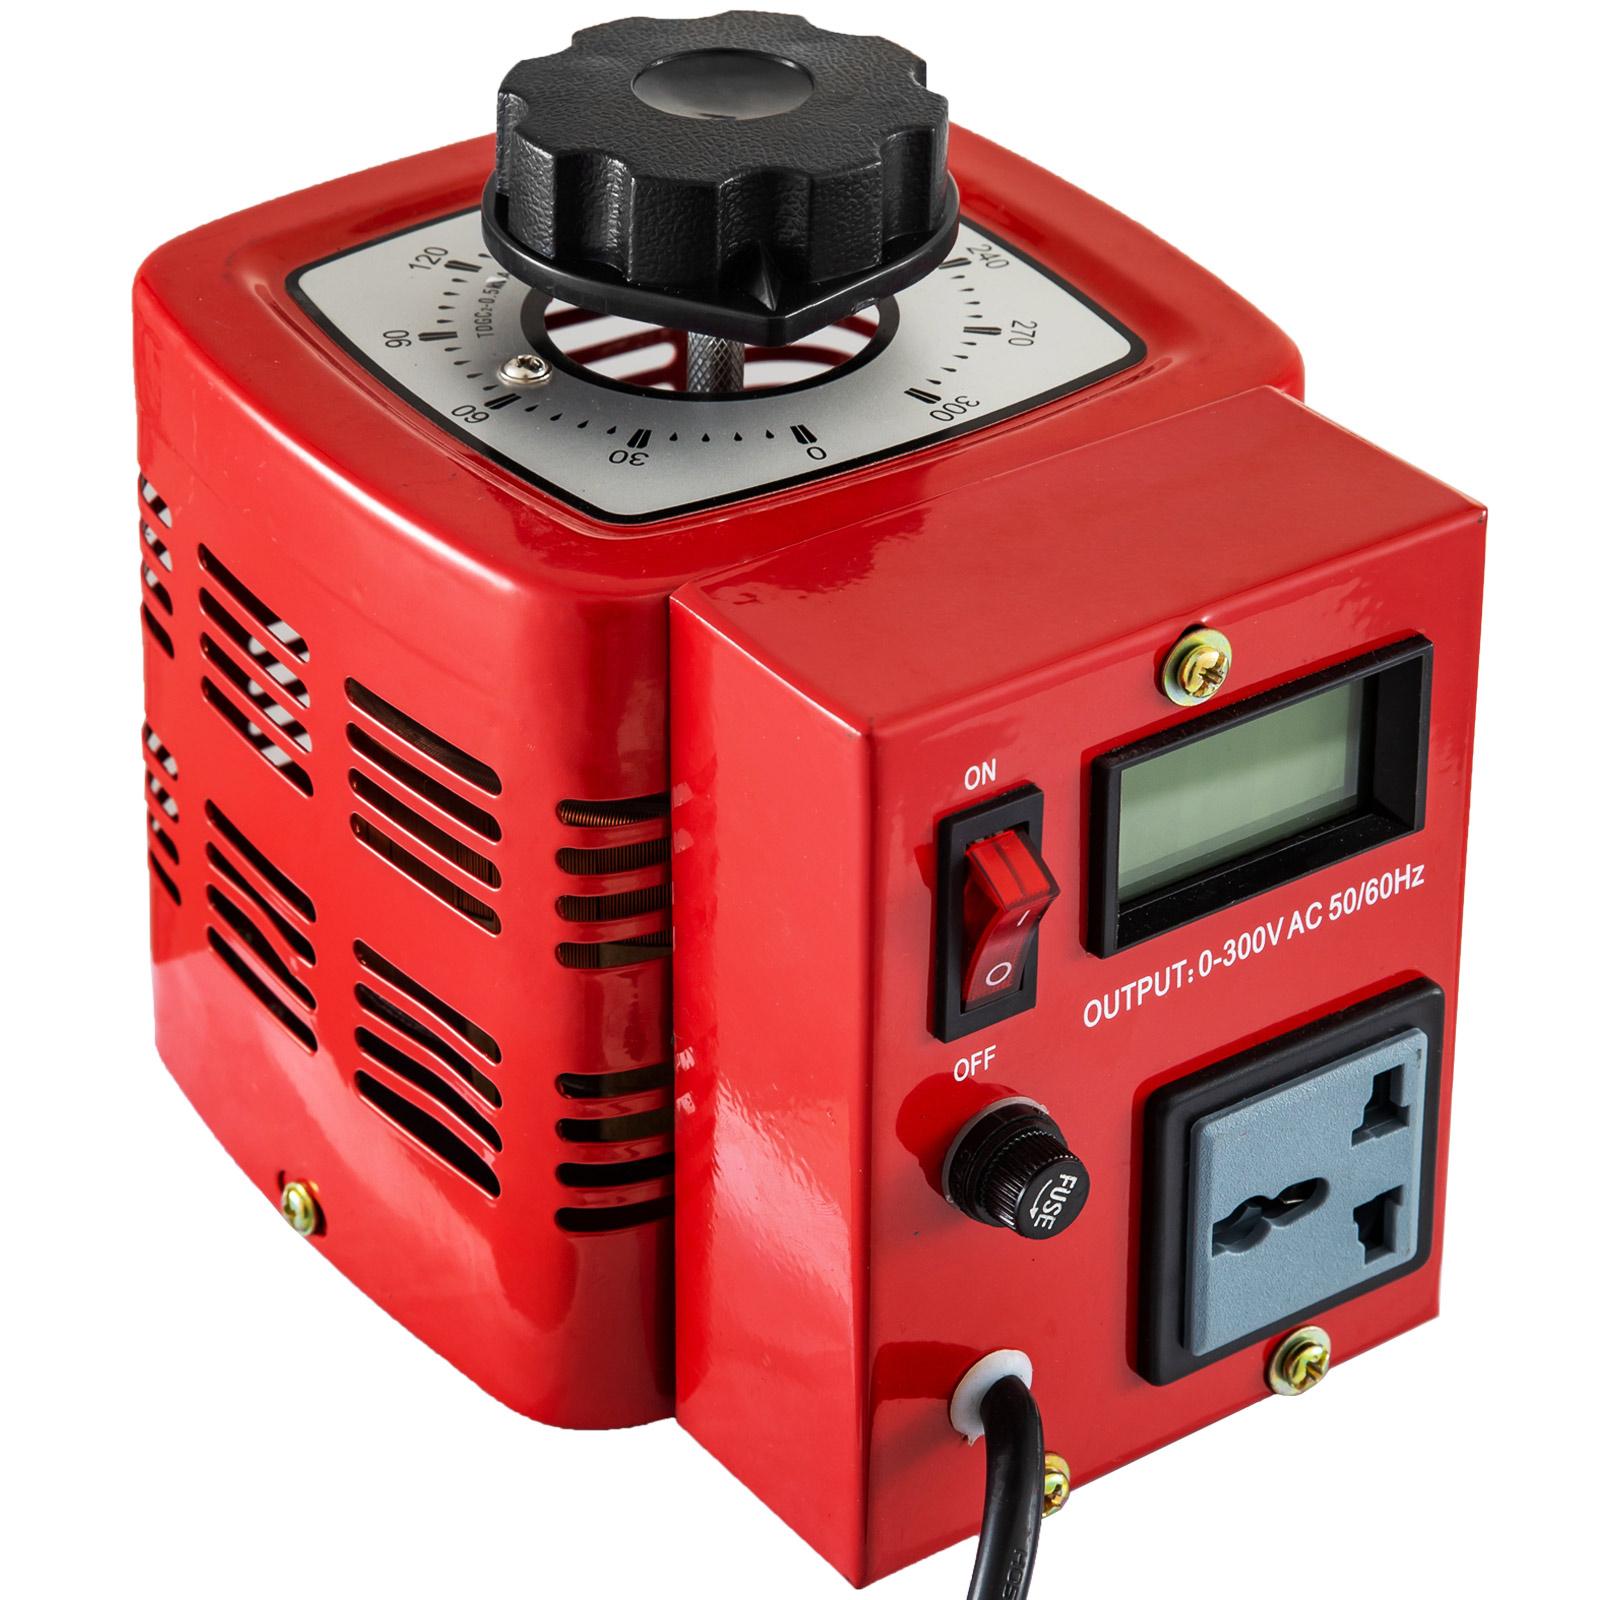 Auto-Variac-Variable-Transformer-0-5-1-2-3KVA-Regulator-pure-copper-coil-220V thumbnail 24